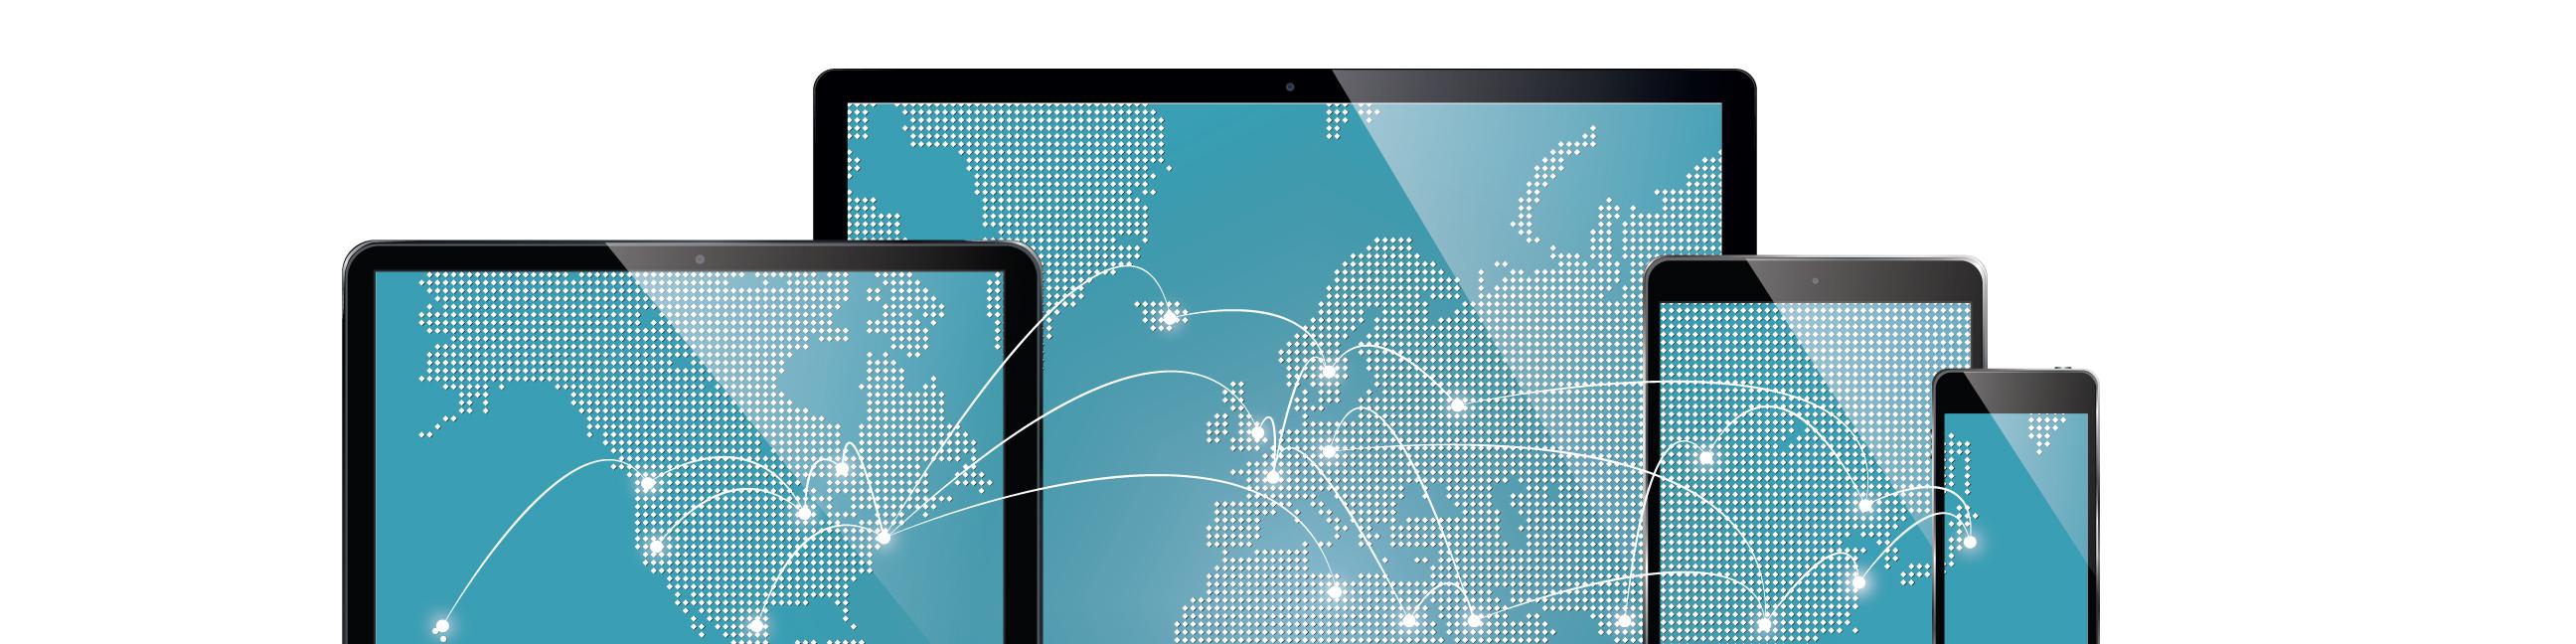 Global Enterprise Strategies, Cyber Security, File Encryption, Secure File Sharing